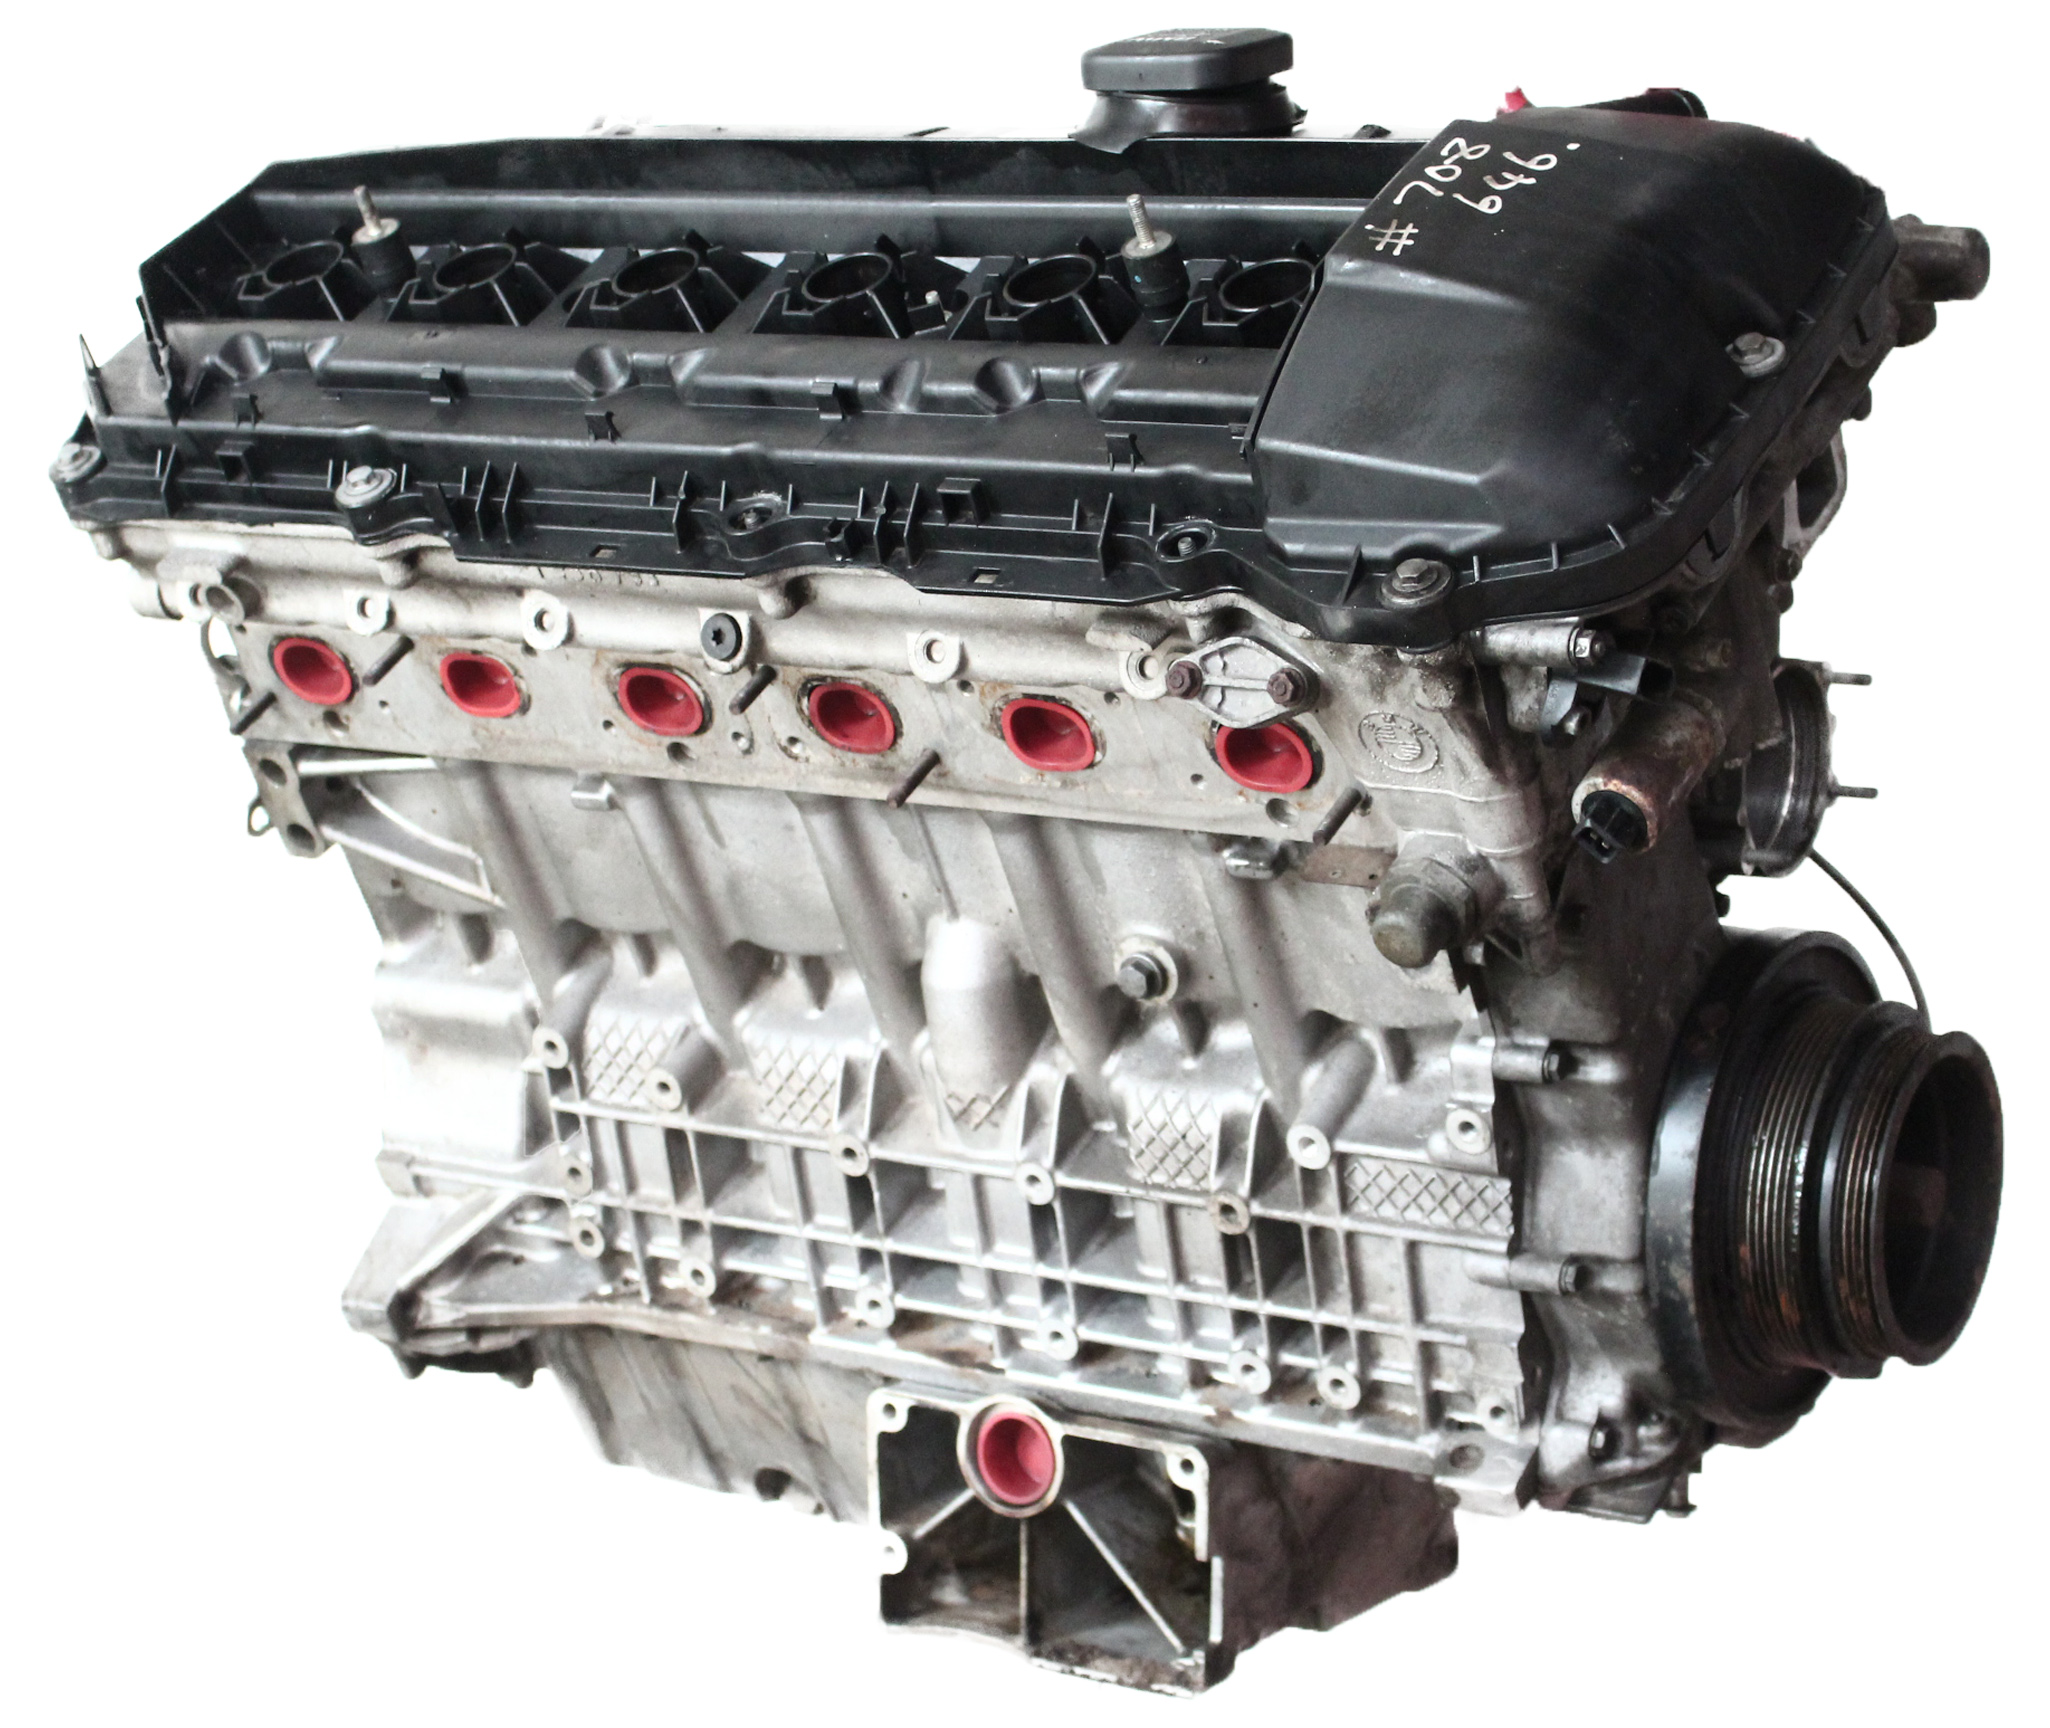 Motor 2005 BMW E83 X3 2,5 i Benzin M54 M54B25 256S5 192 PS